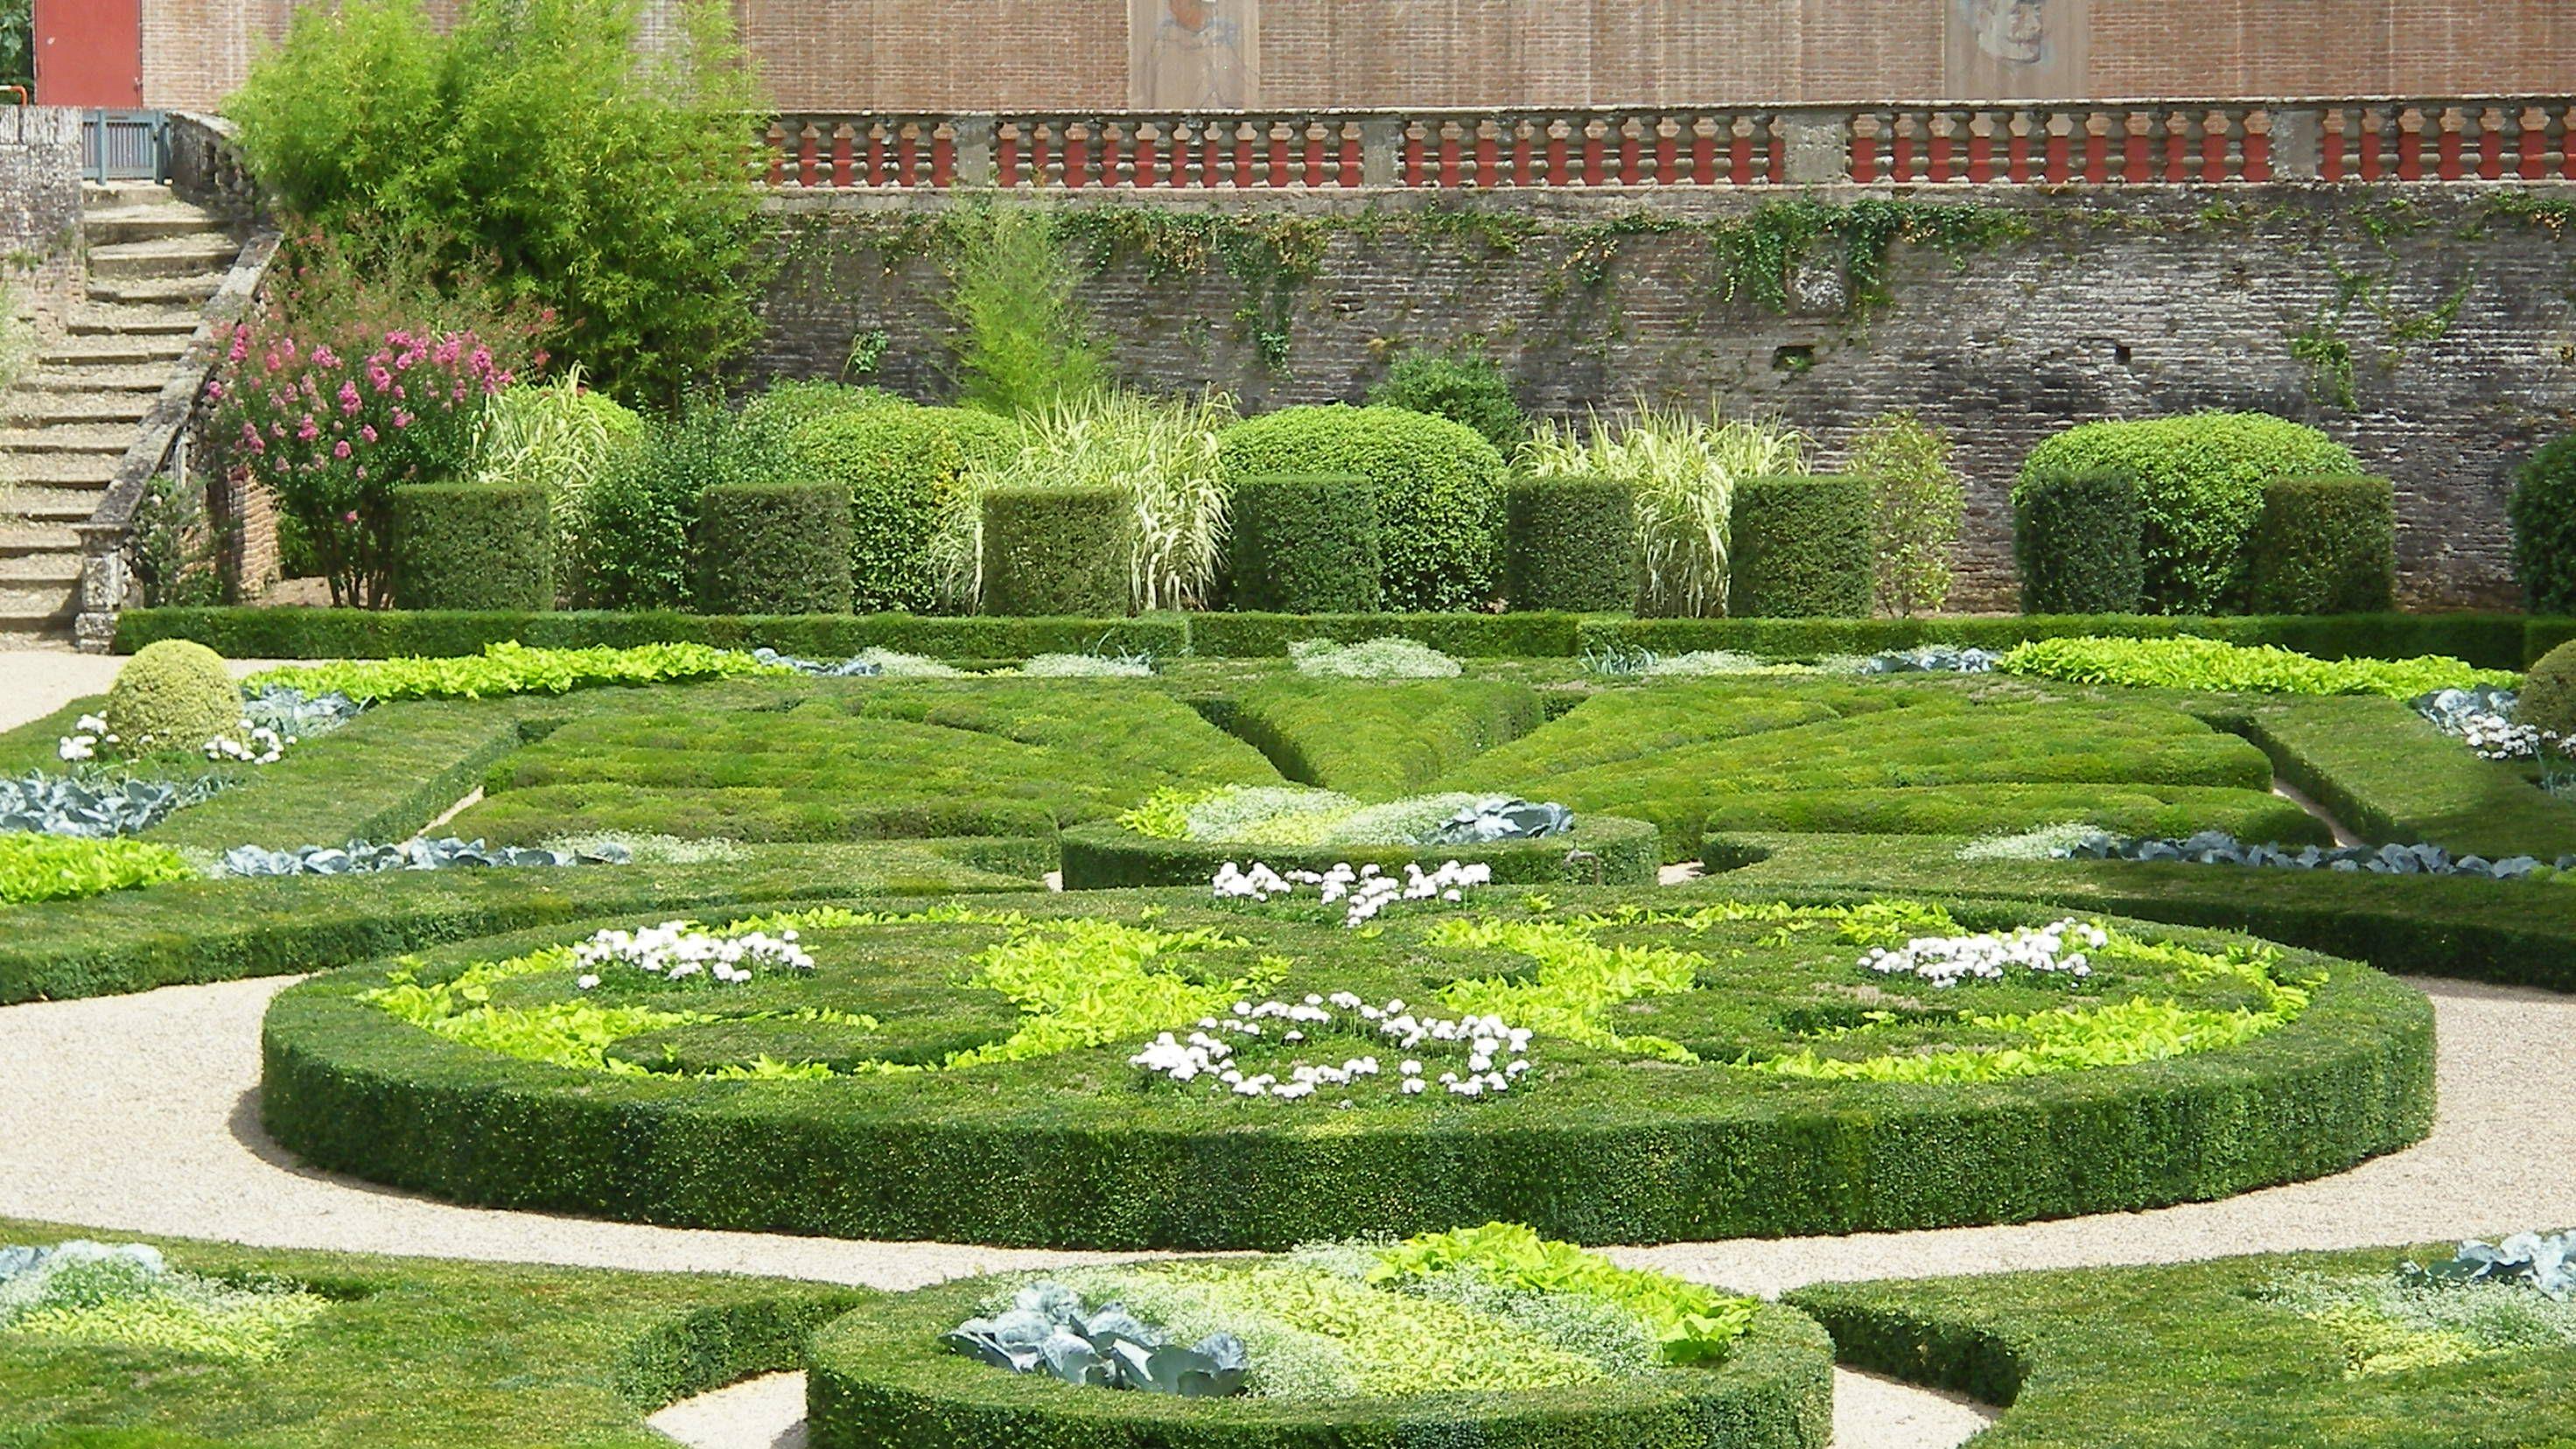 Albi jardins du palais de la berbie class s jardins for Jardin 4 saisons albi